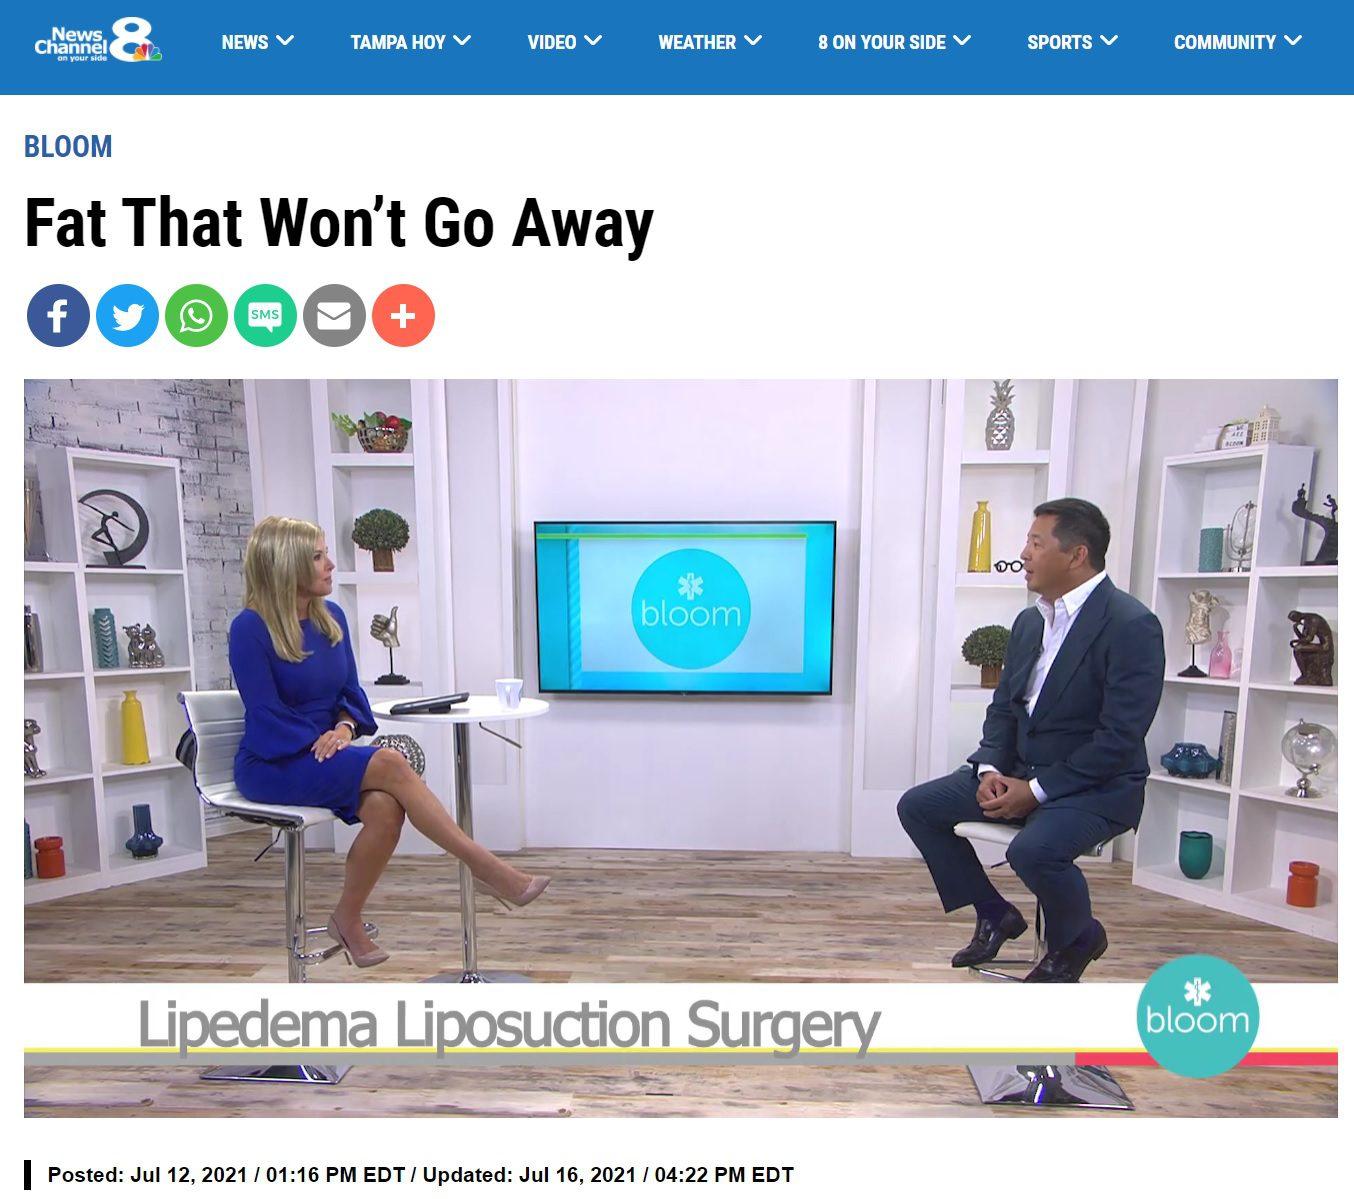 bloom-interview-lipedema-liposuction-surgery